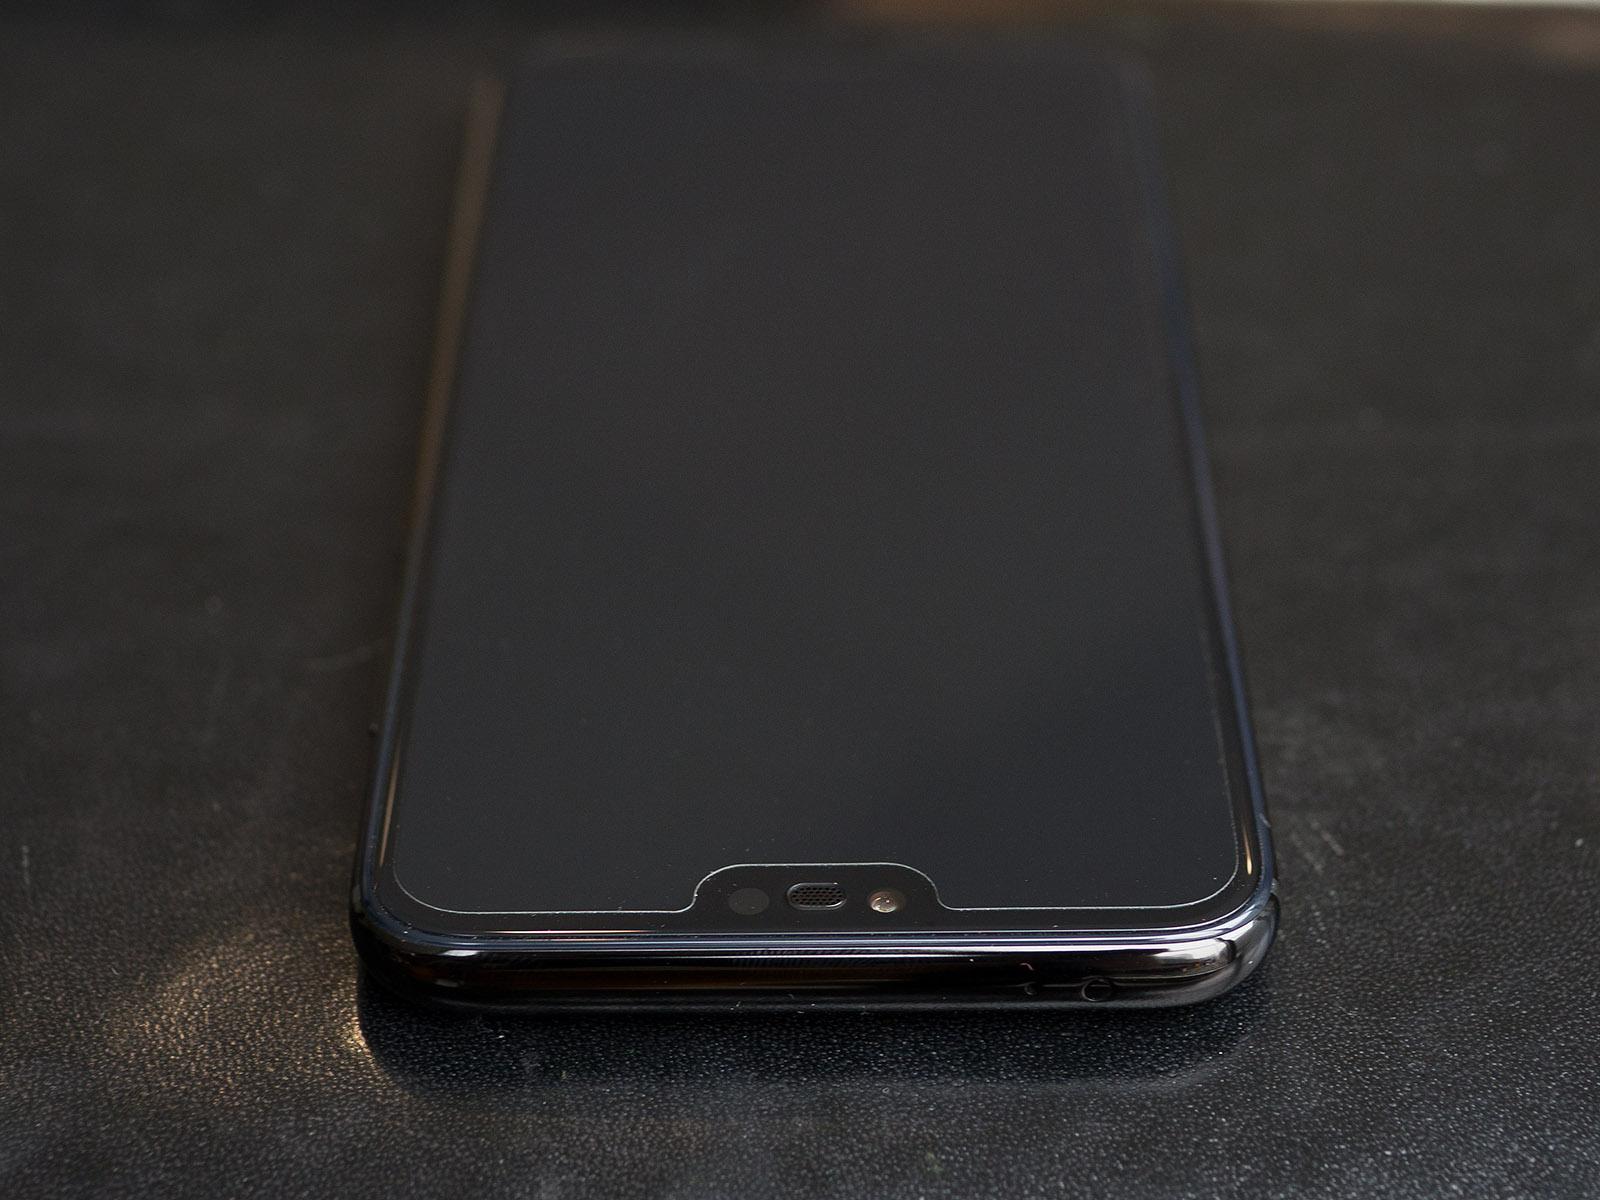 Как фотографирует новый Honor 10. Сравниваем с Huawei P20 и iPhone 7 Plus - 28